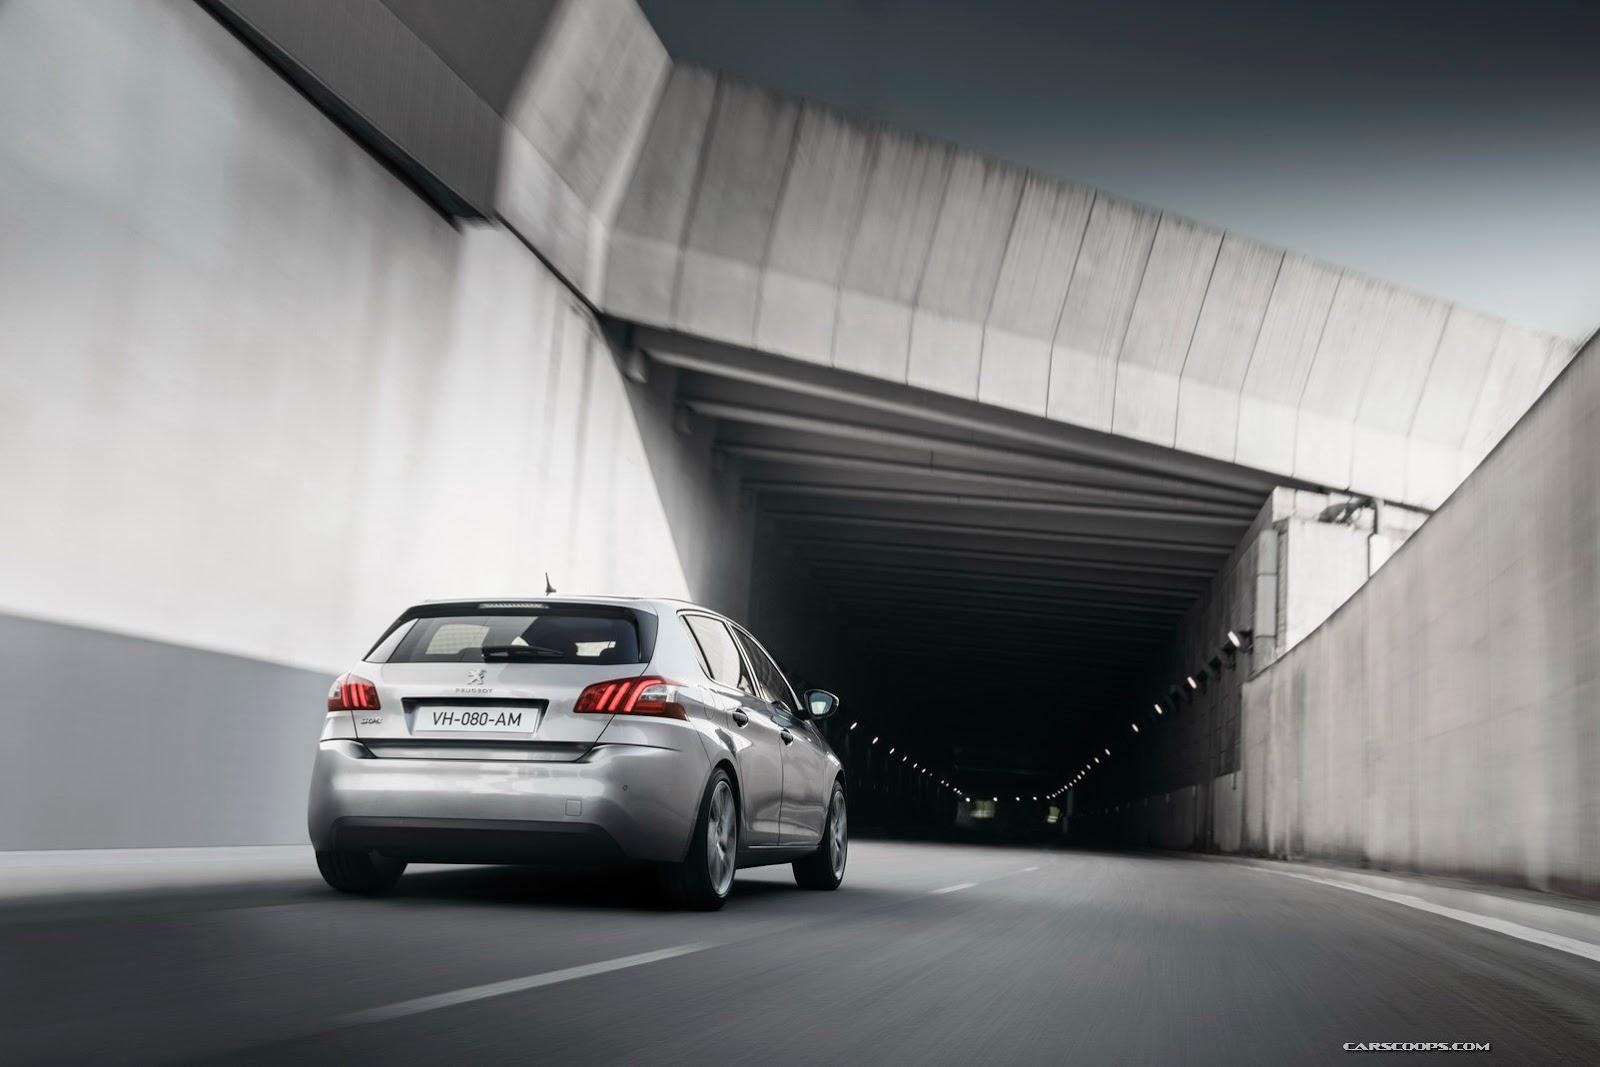 2014-Peugeot-308-Hatch-Carscoops-81%25255B2%25255D.jpg